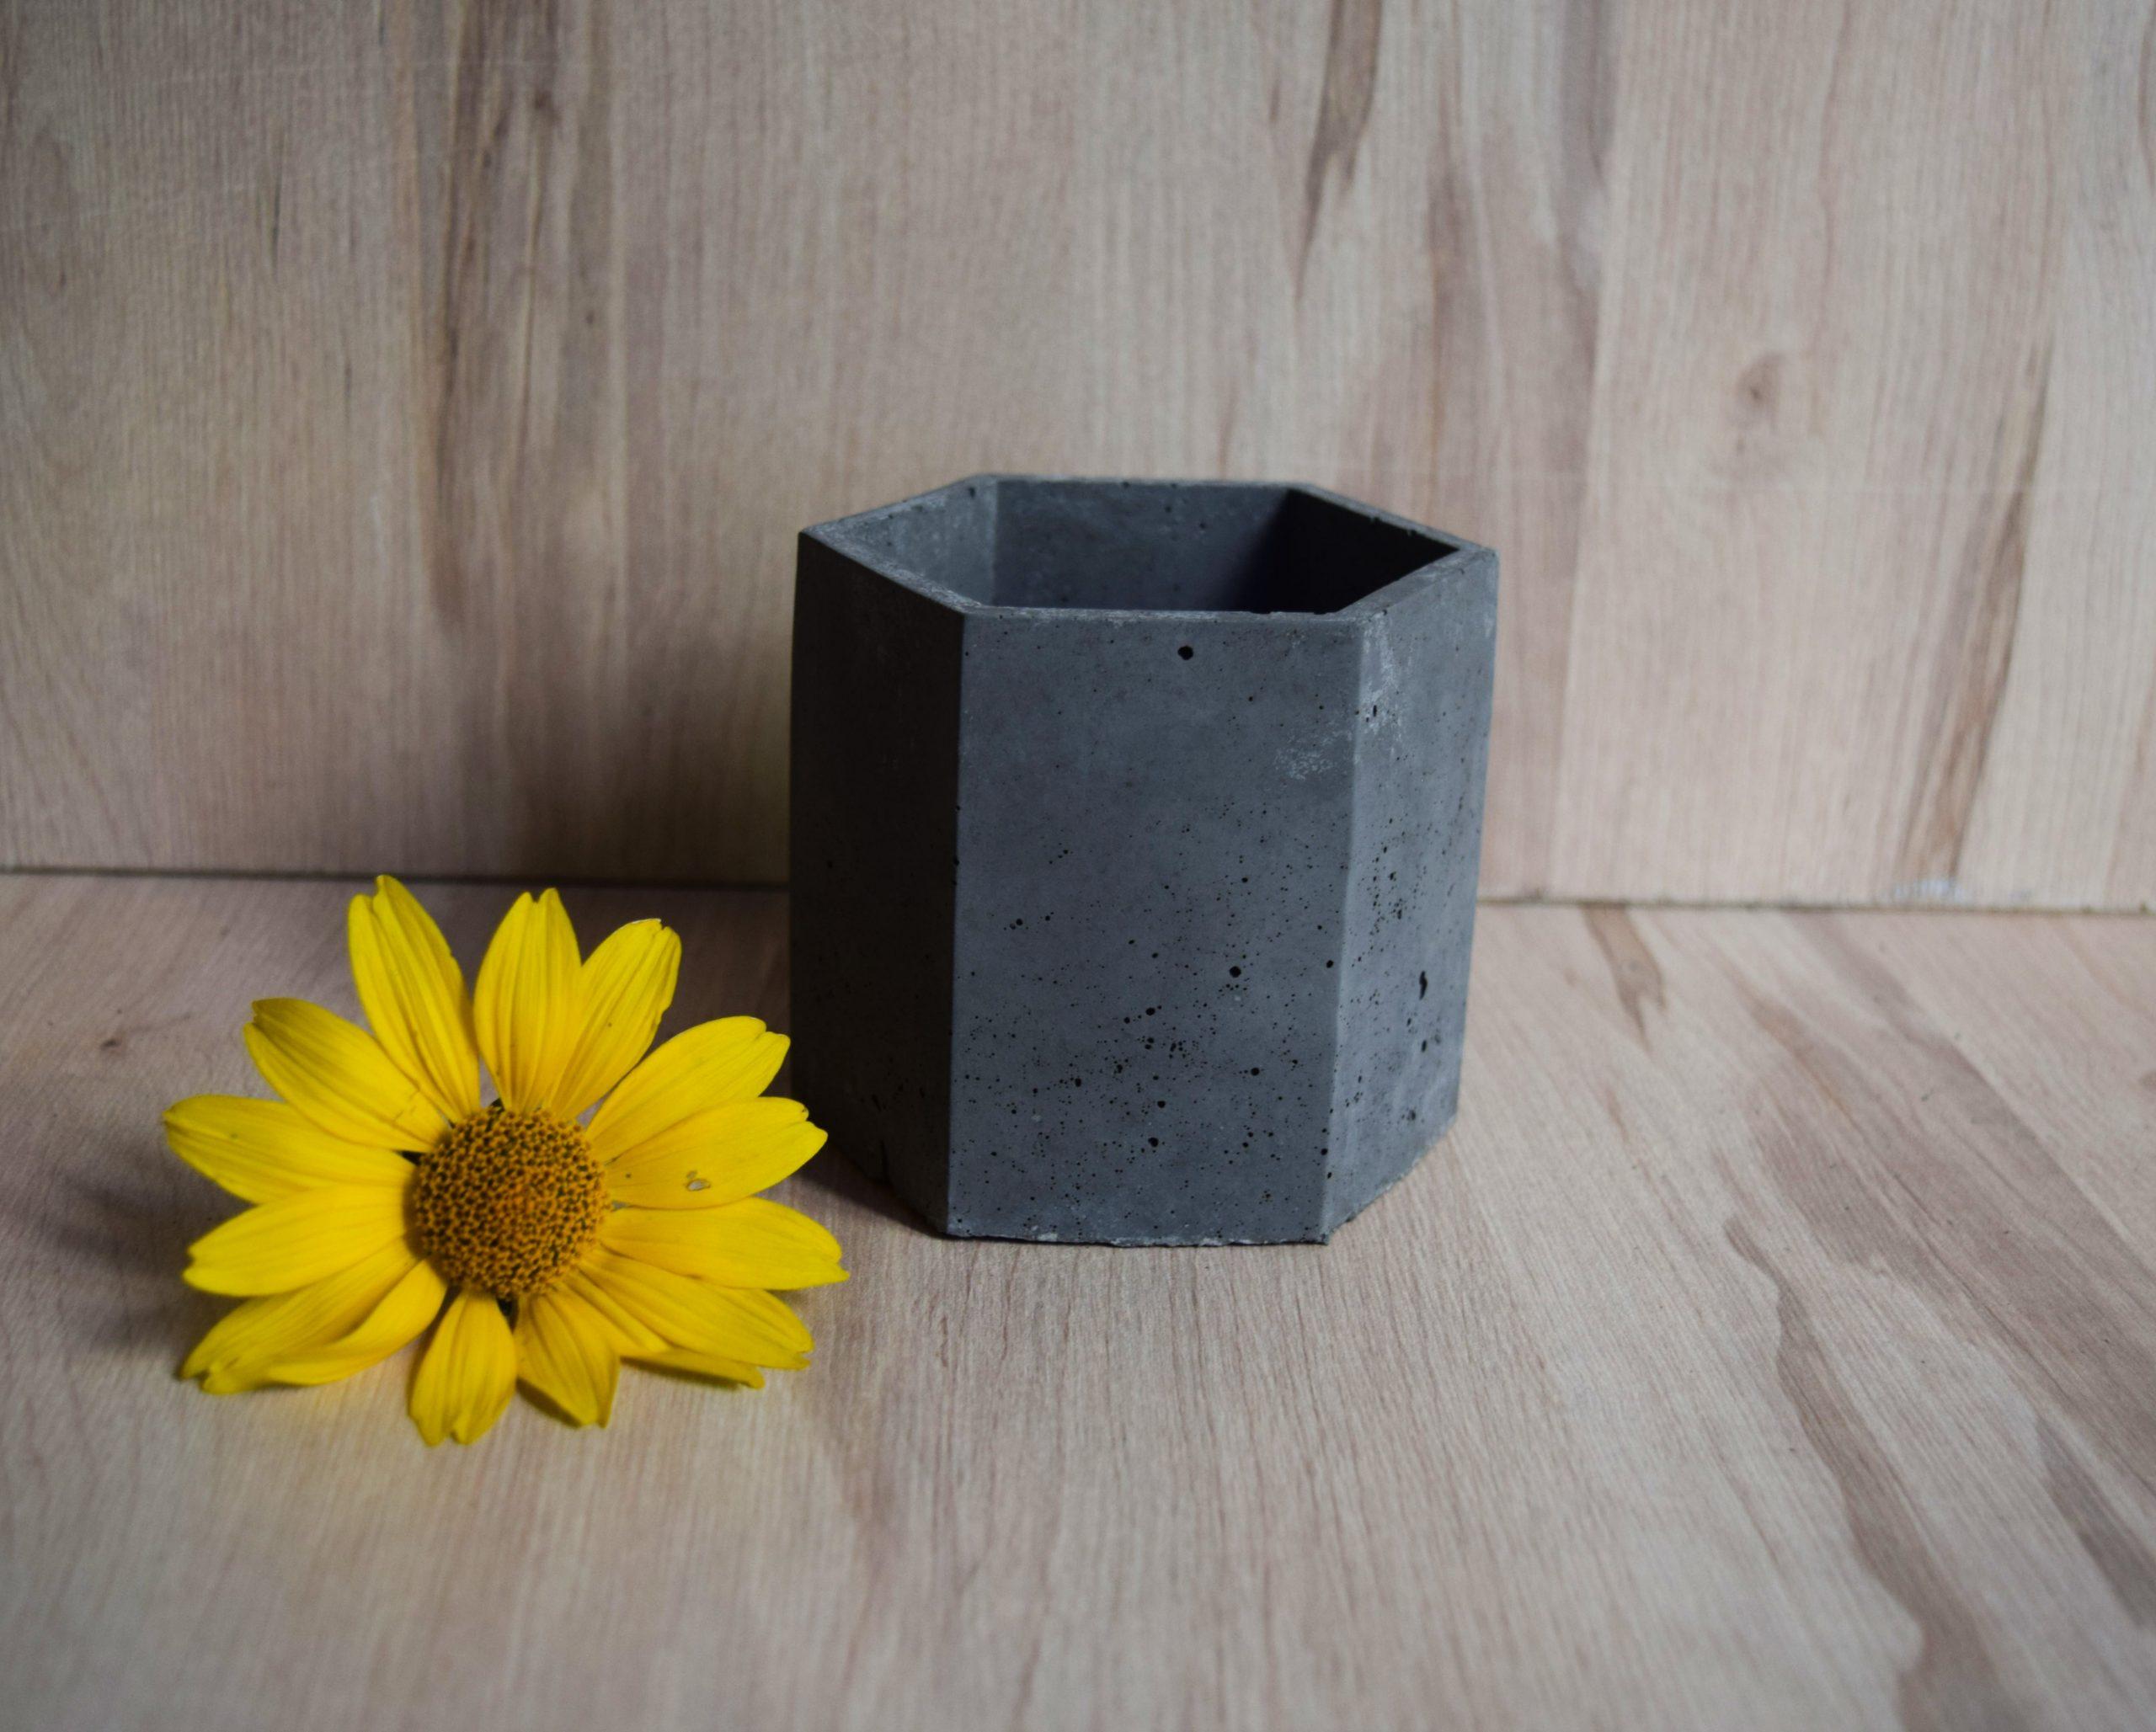 Osłonka betonowa ciemnoszara sześciokątna